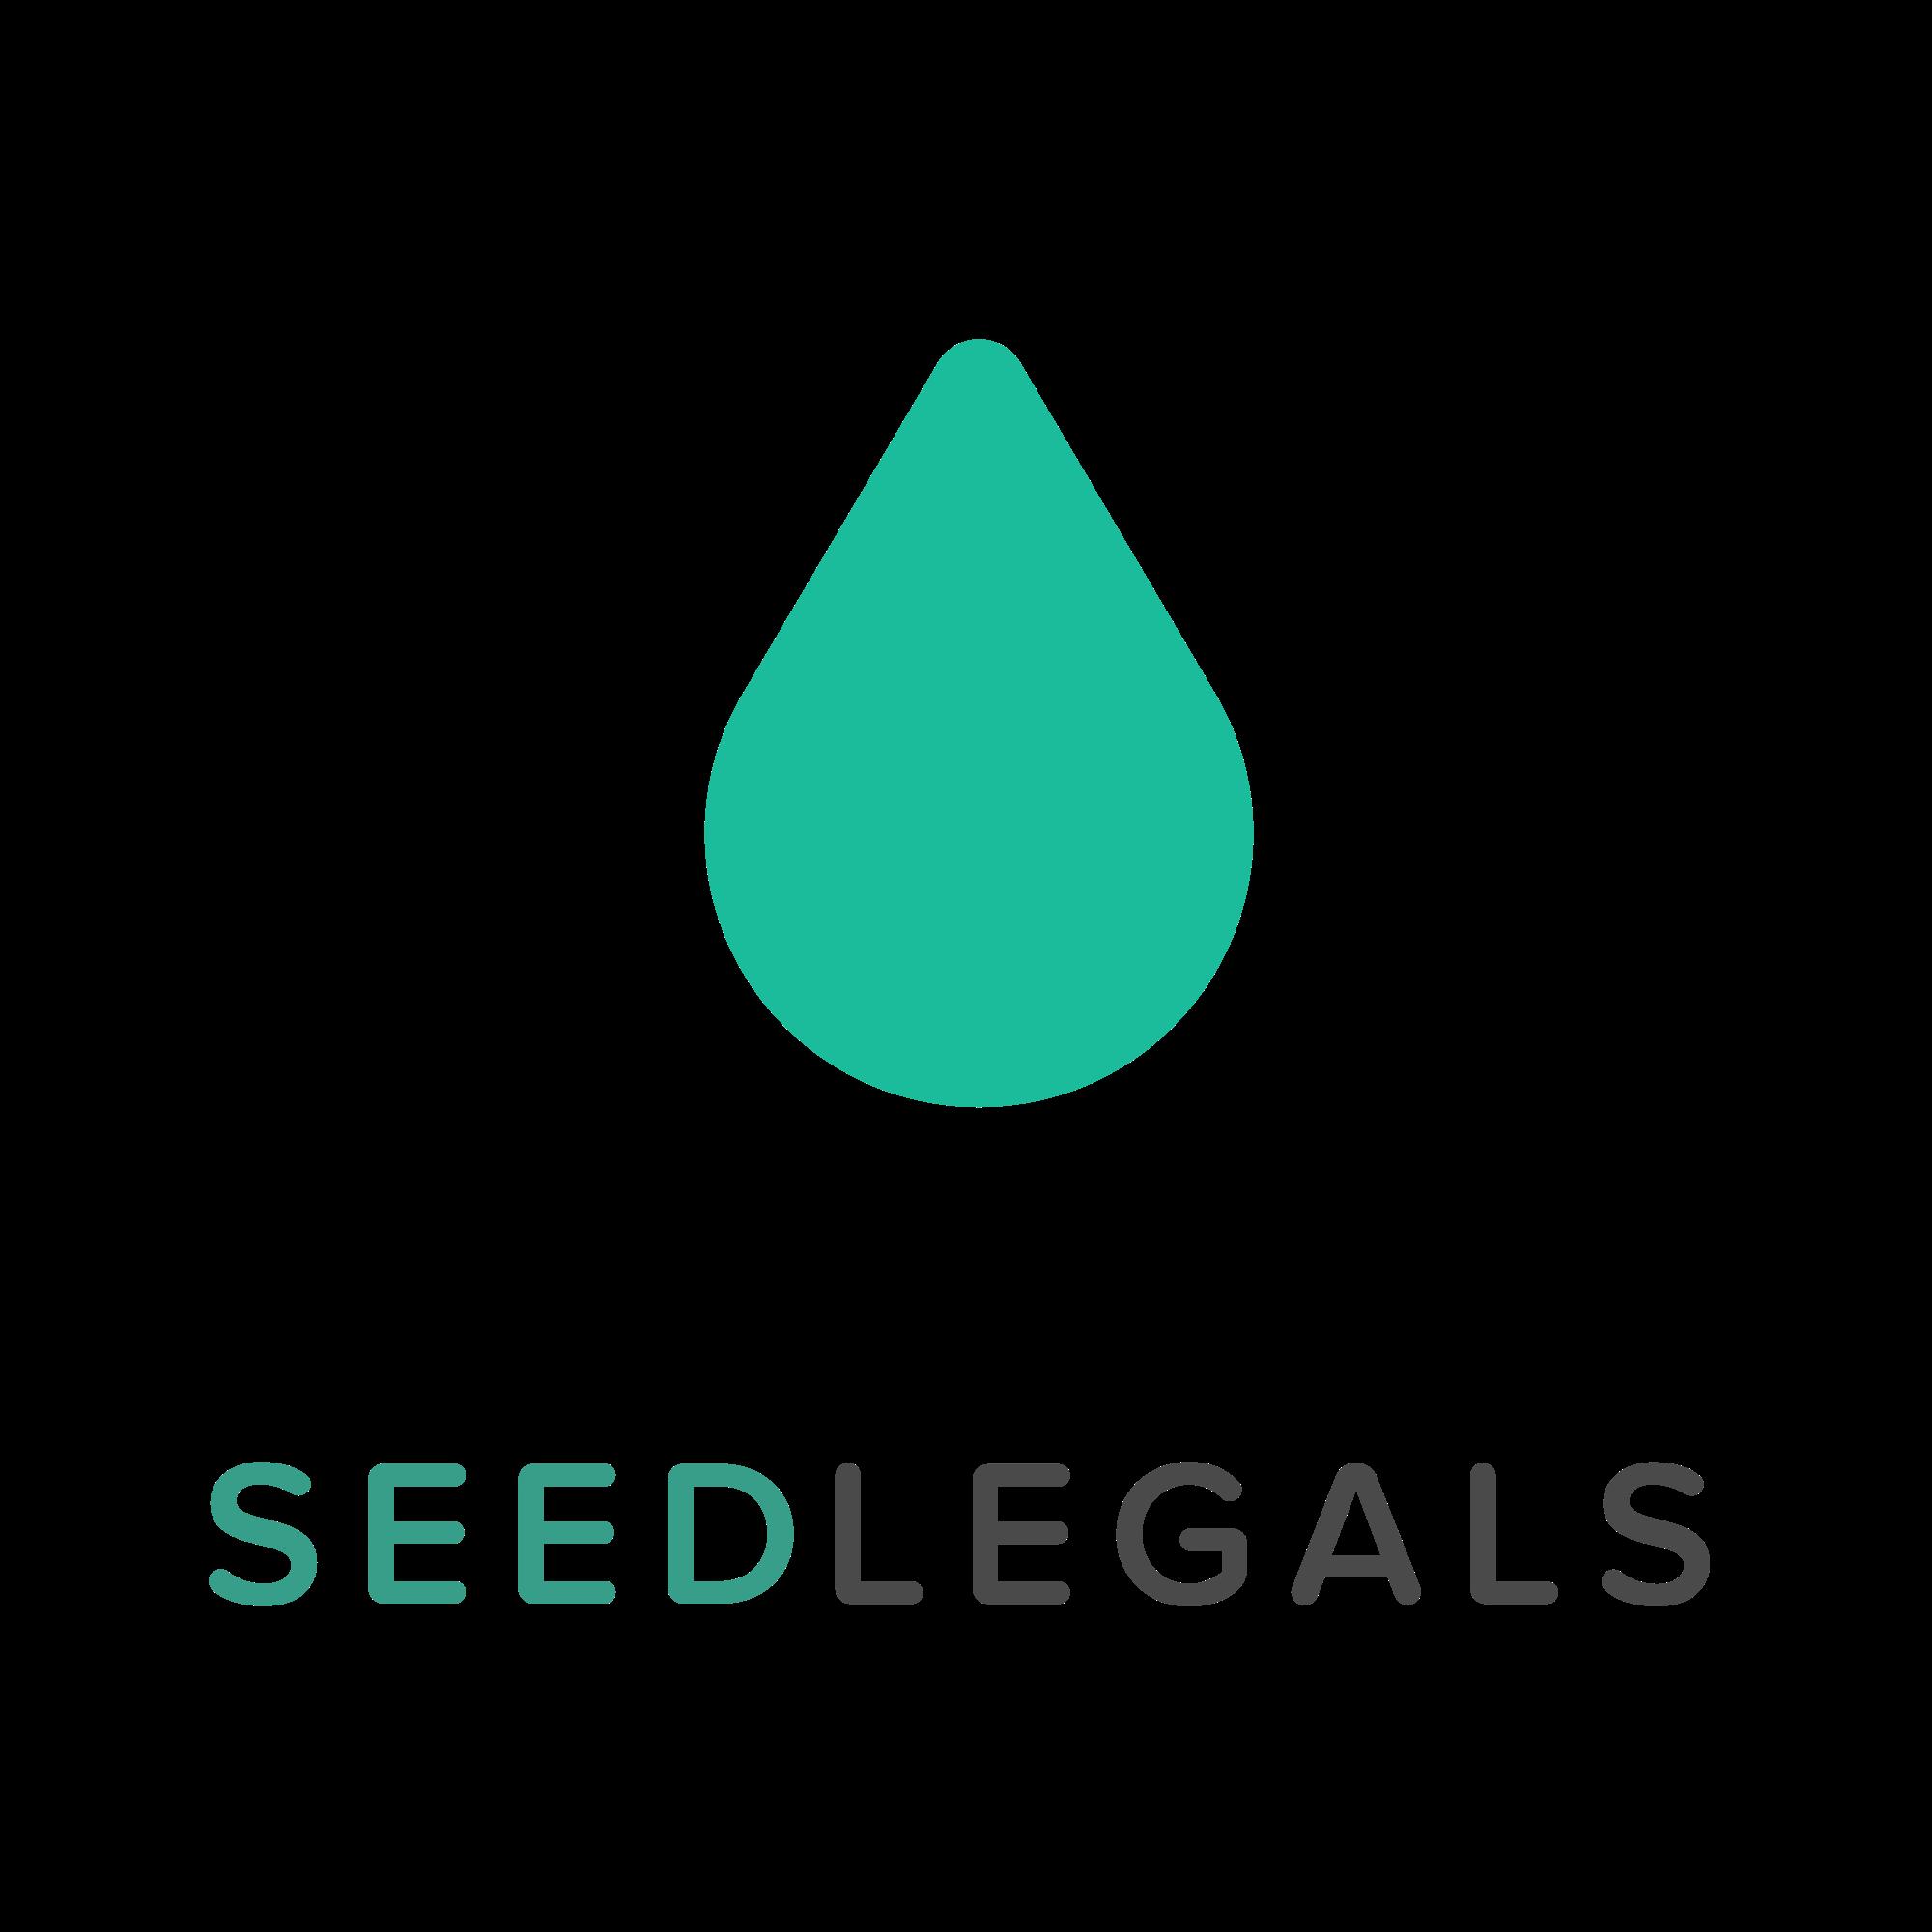 SeedLegals logo